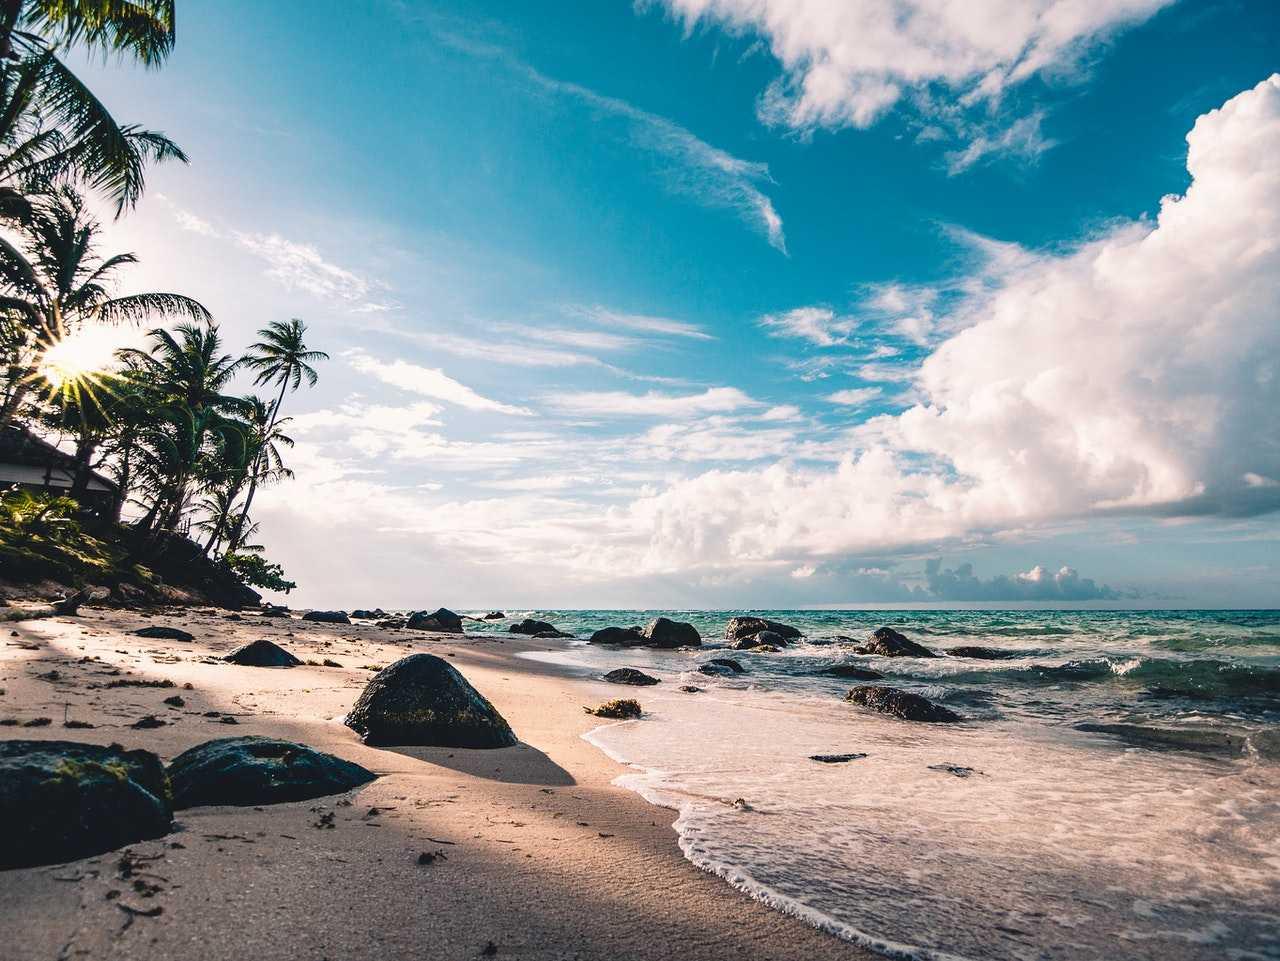 Mengapa air laut asin